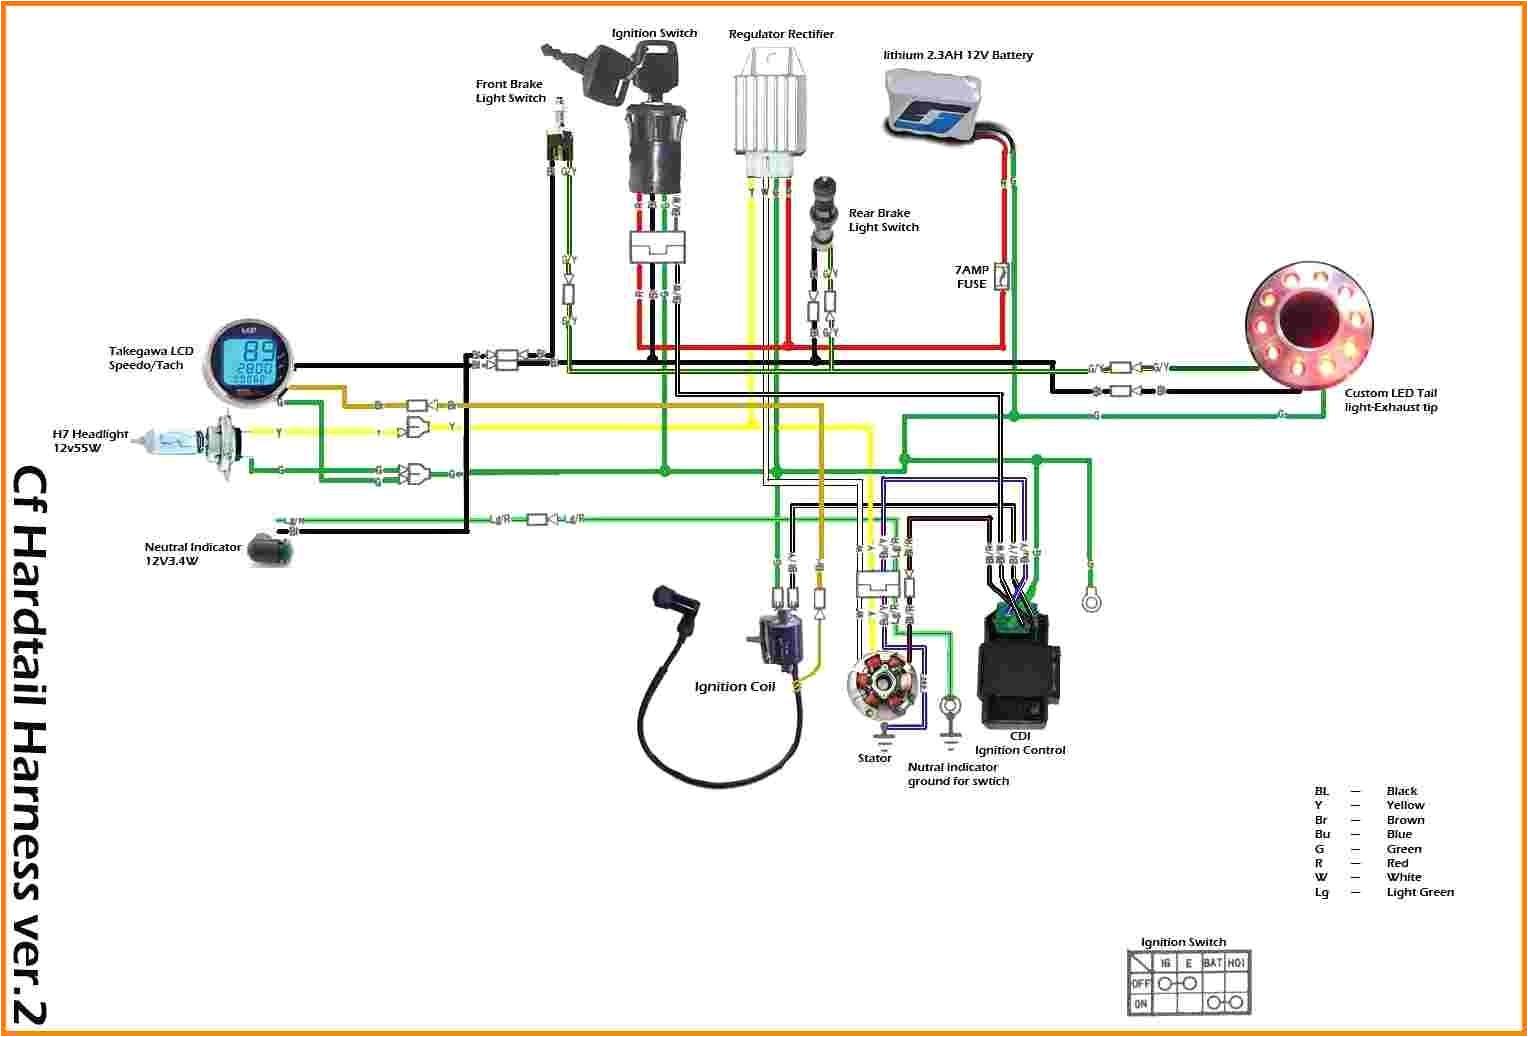 Chinese 110 atv Wiring Diagram Chinese Wiring Diagram Wiring Diagrams Show